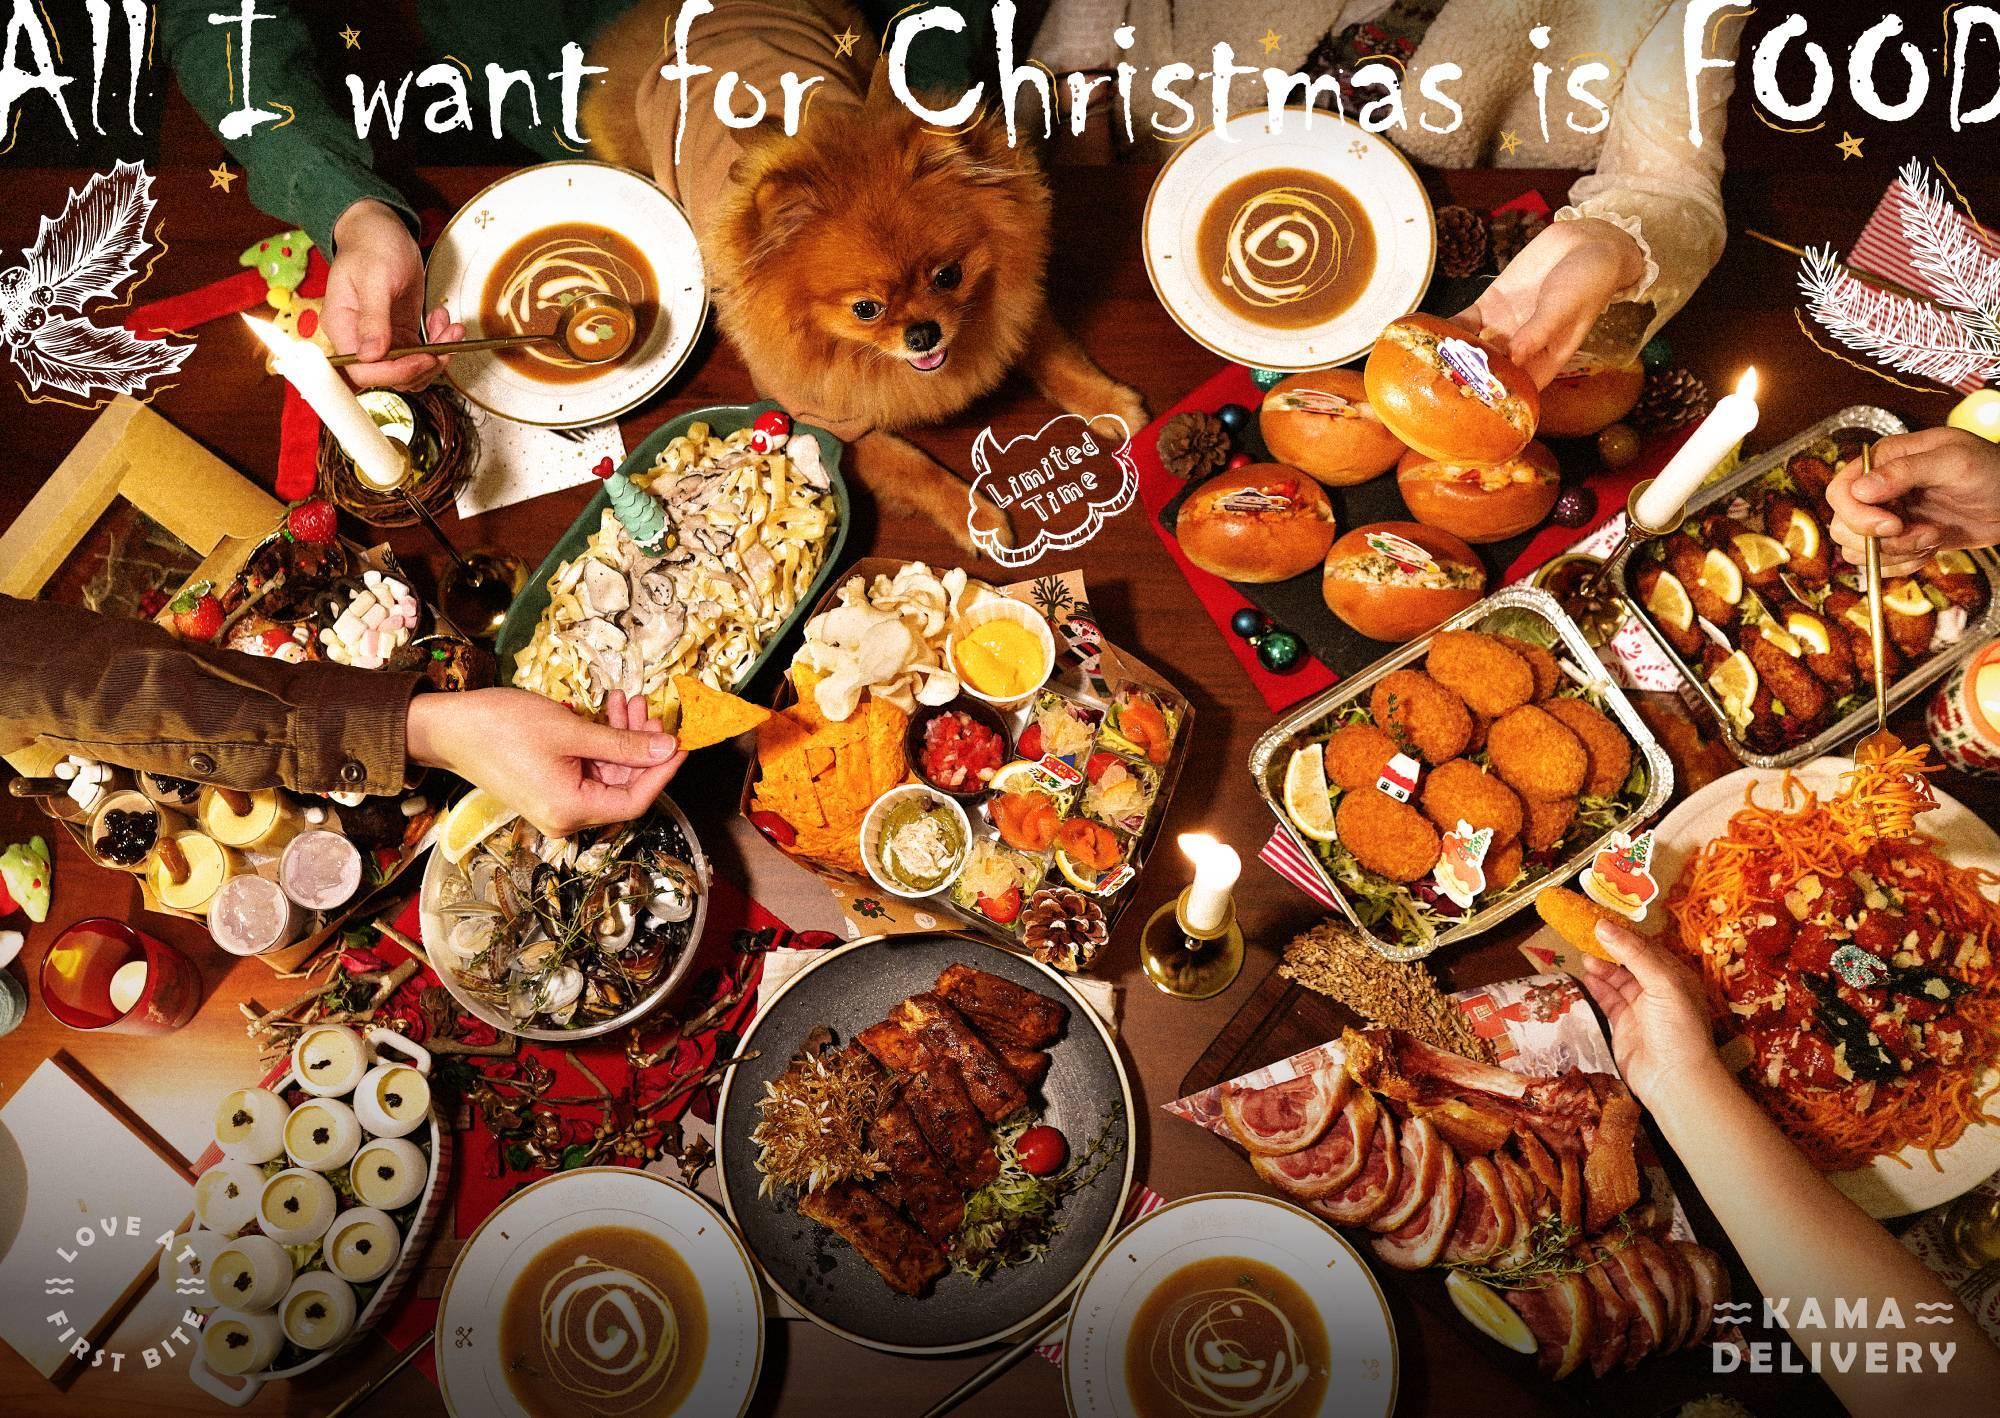 Kama Delivery 聖誕美食速遞外賣|平價聖誕節大餐|免費送貨|聖誕大食會推介